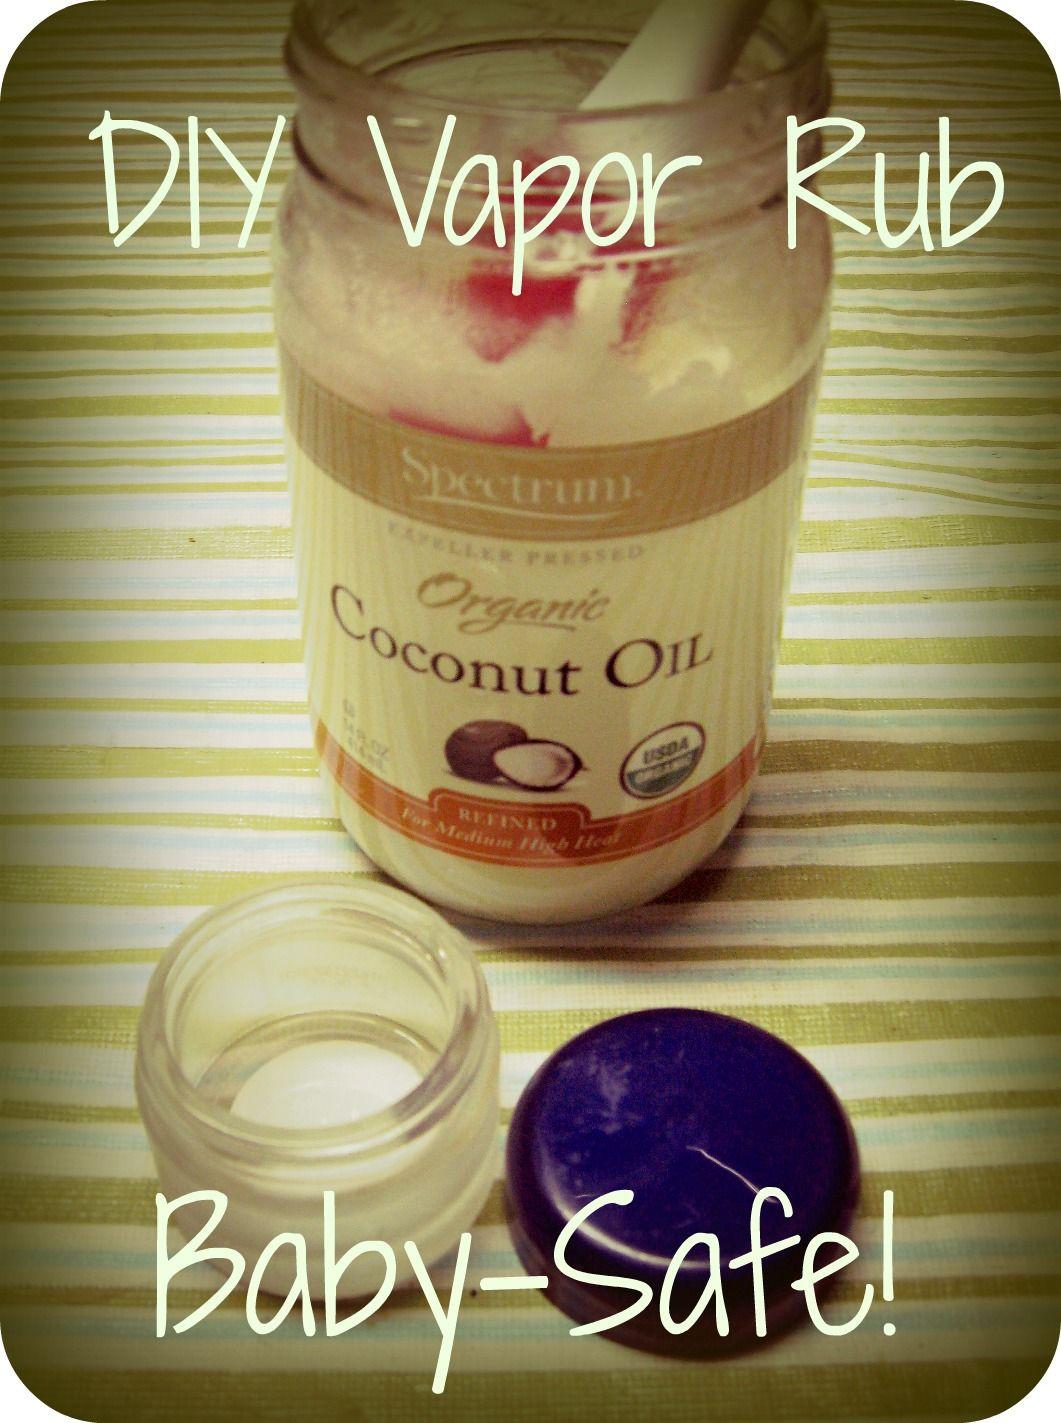 Diy Vapor Rub 3 Tbsp Coconut Oil 5 10 Drops Eucalyptus